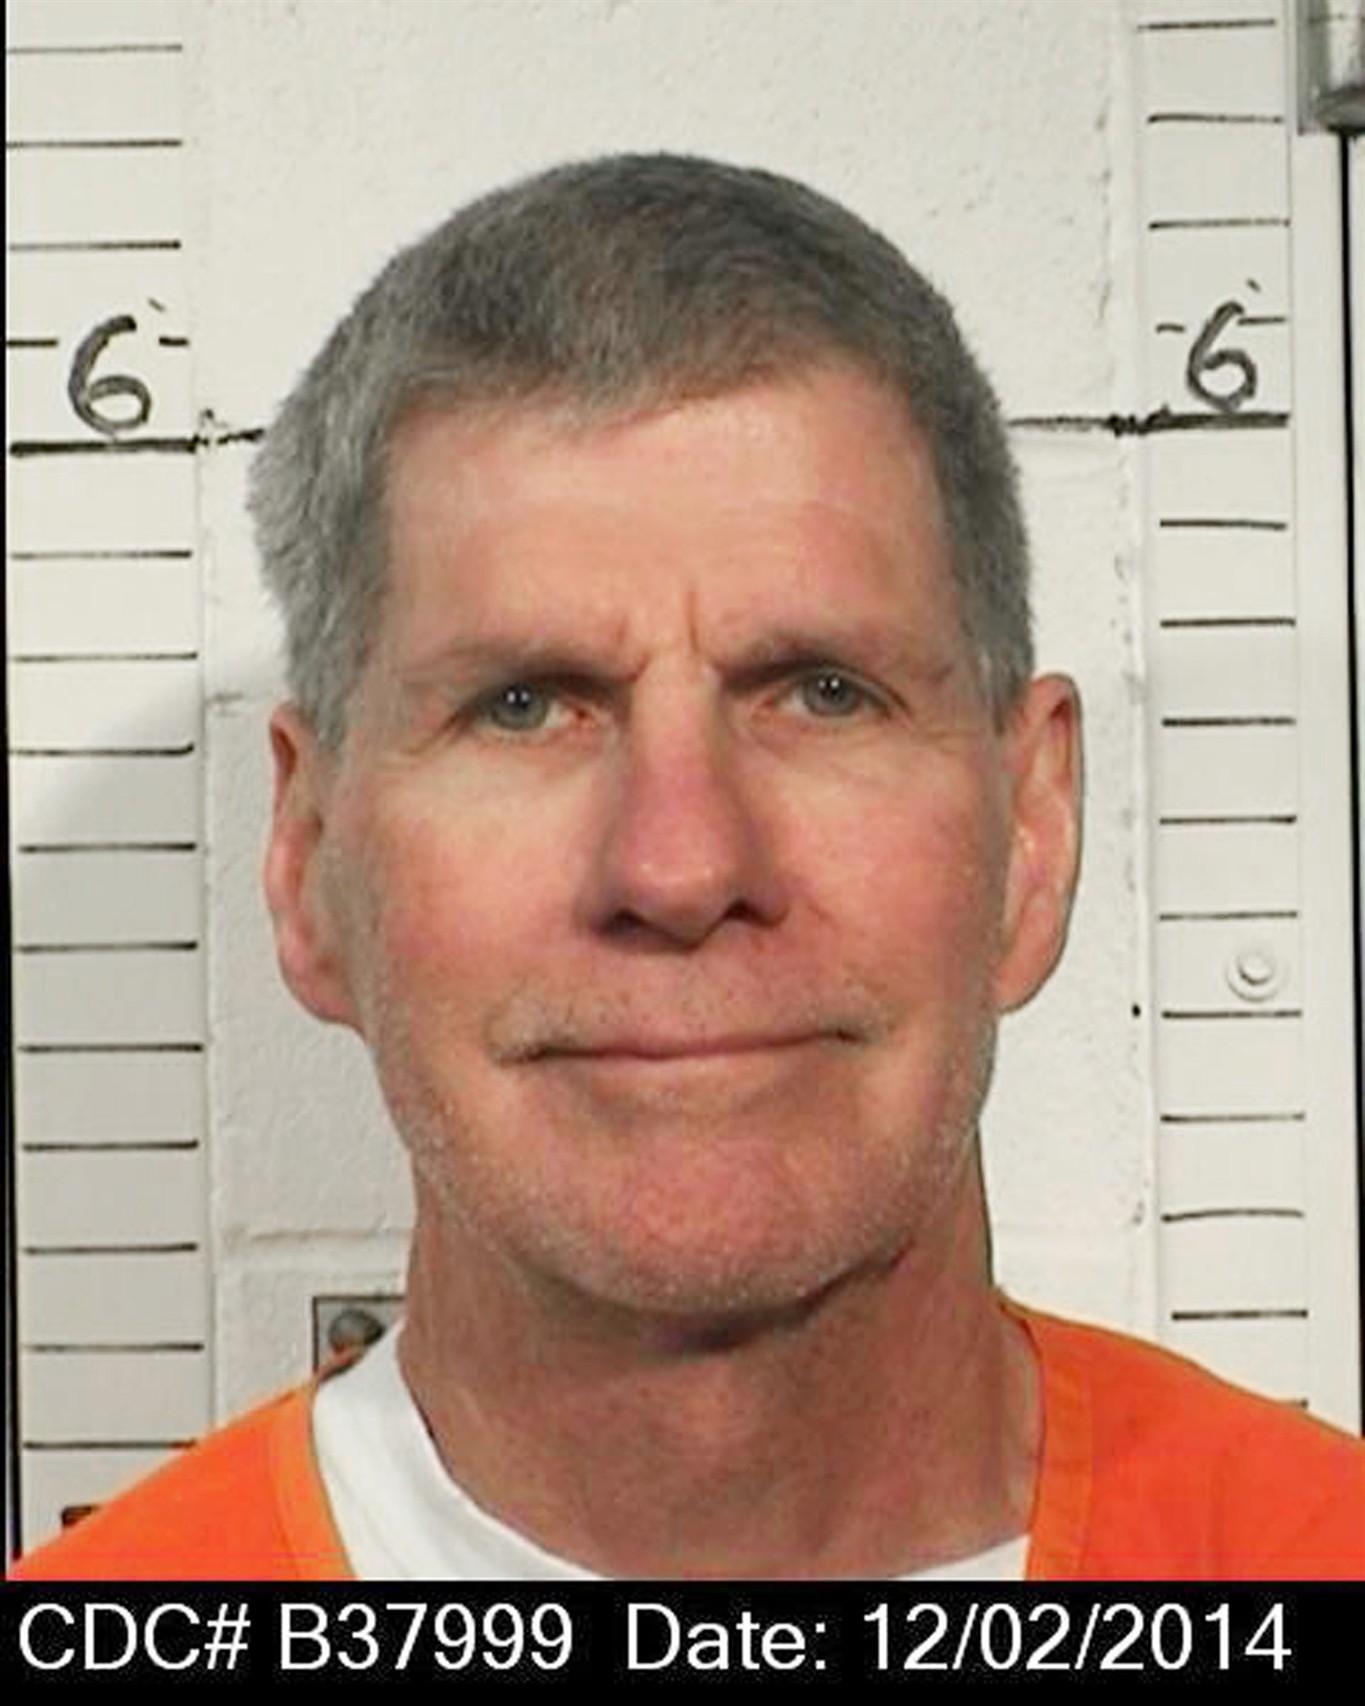 Chales Manson follower 'Tex' Watson refused parole in California